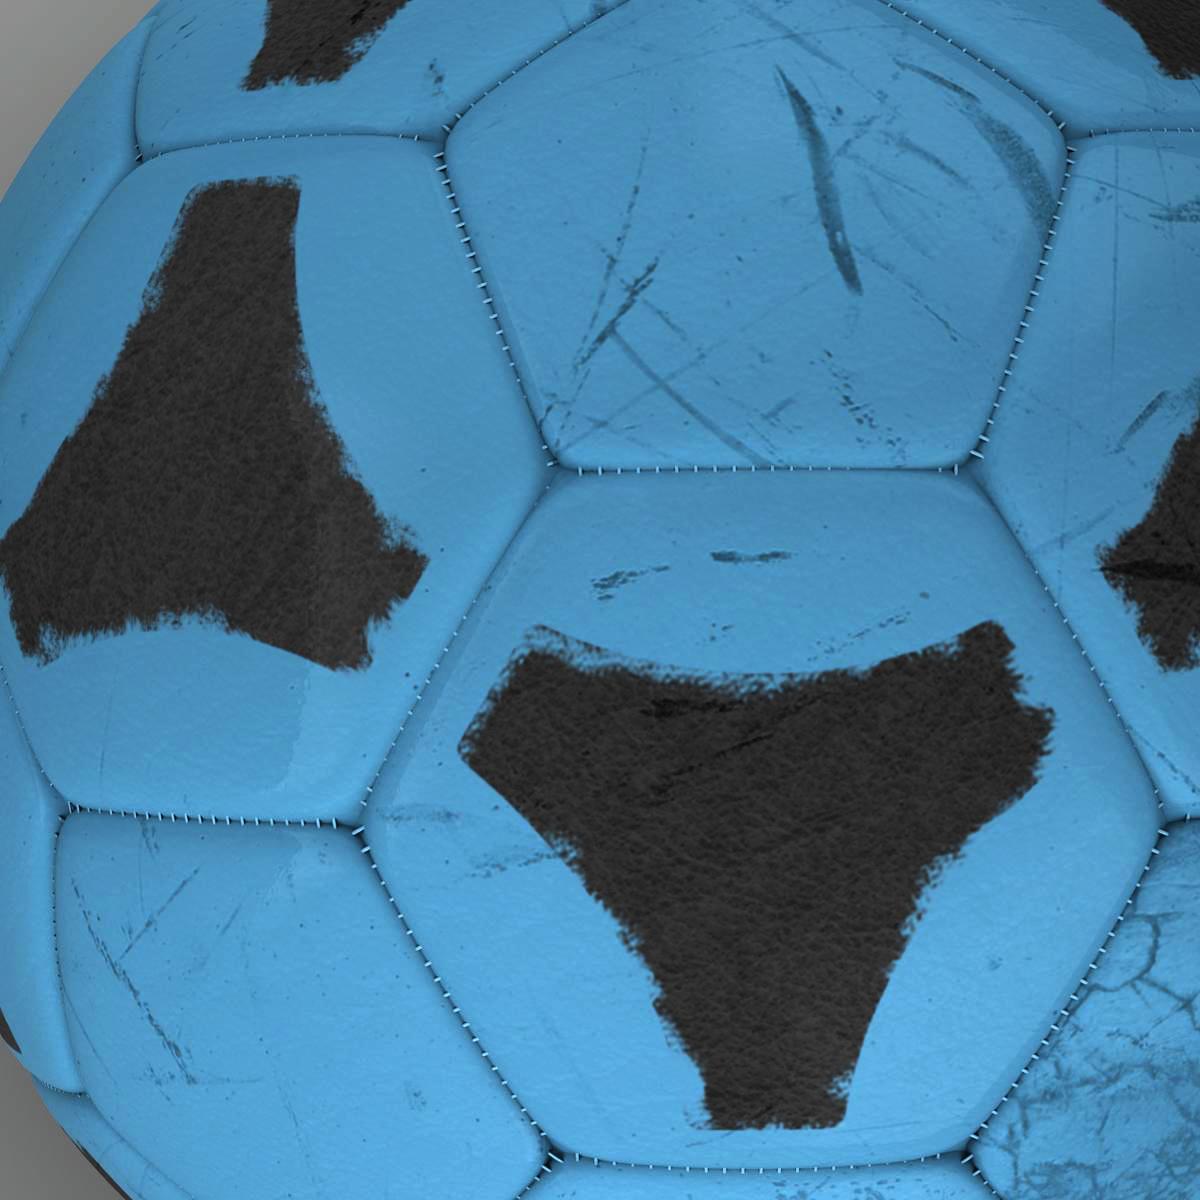 soccerball цэнхэр хар 3d загвар 3ds max fbx c4d ma mb obj 204378